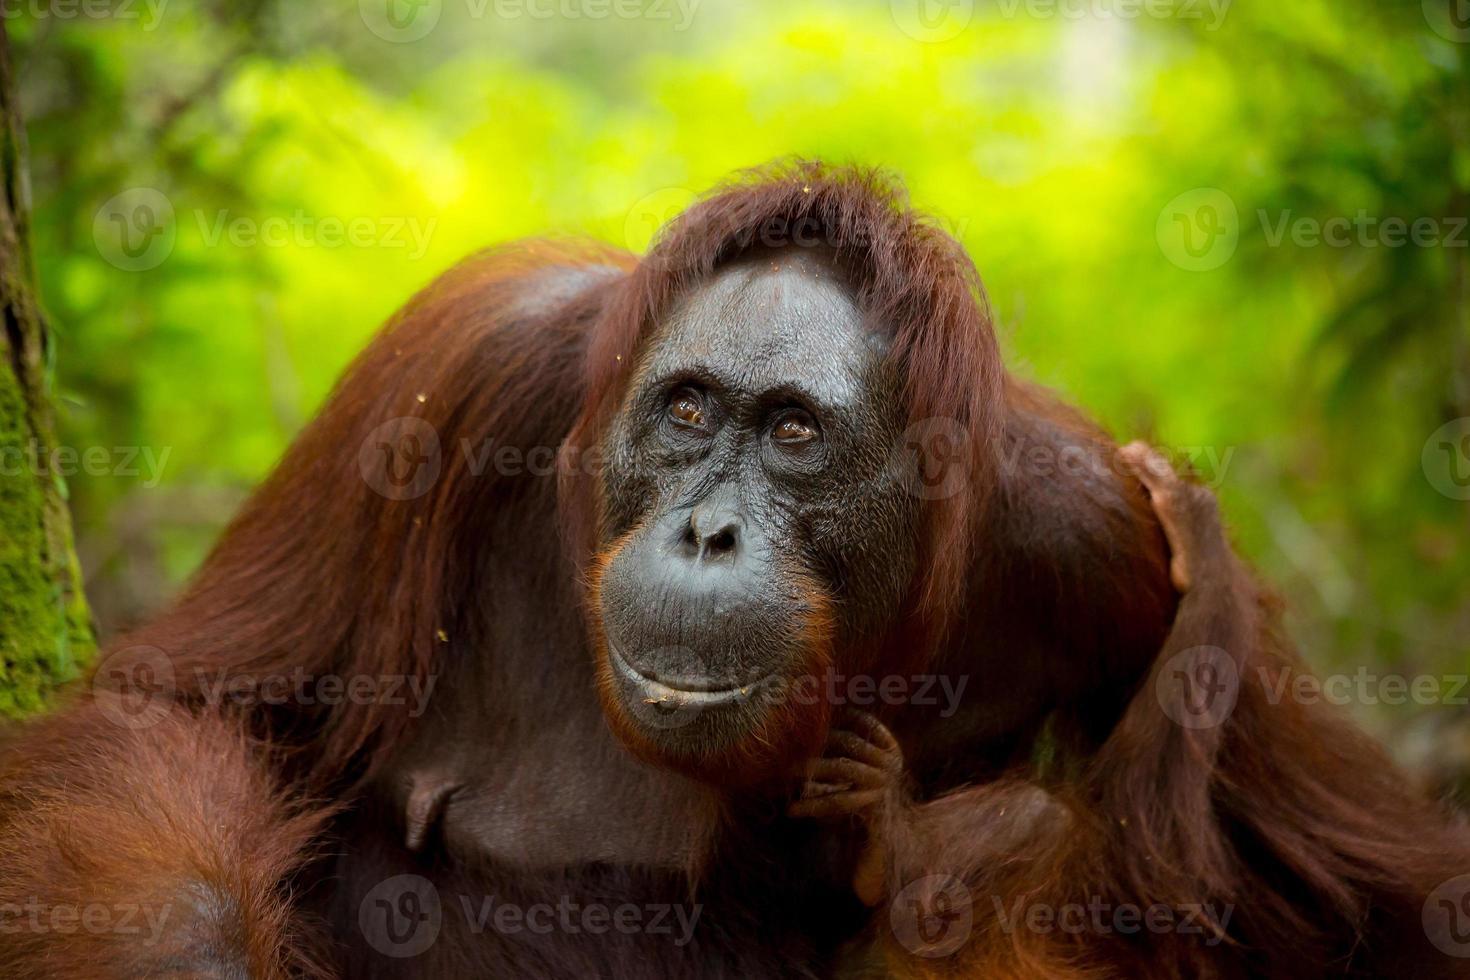 orangotango feminino em Bornéu. foto